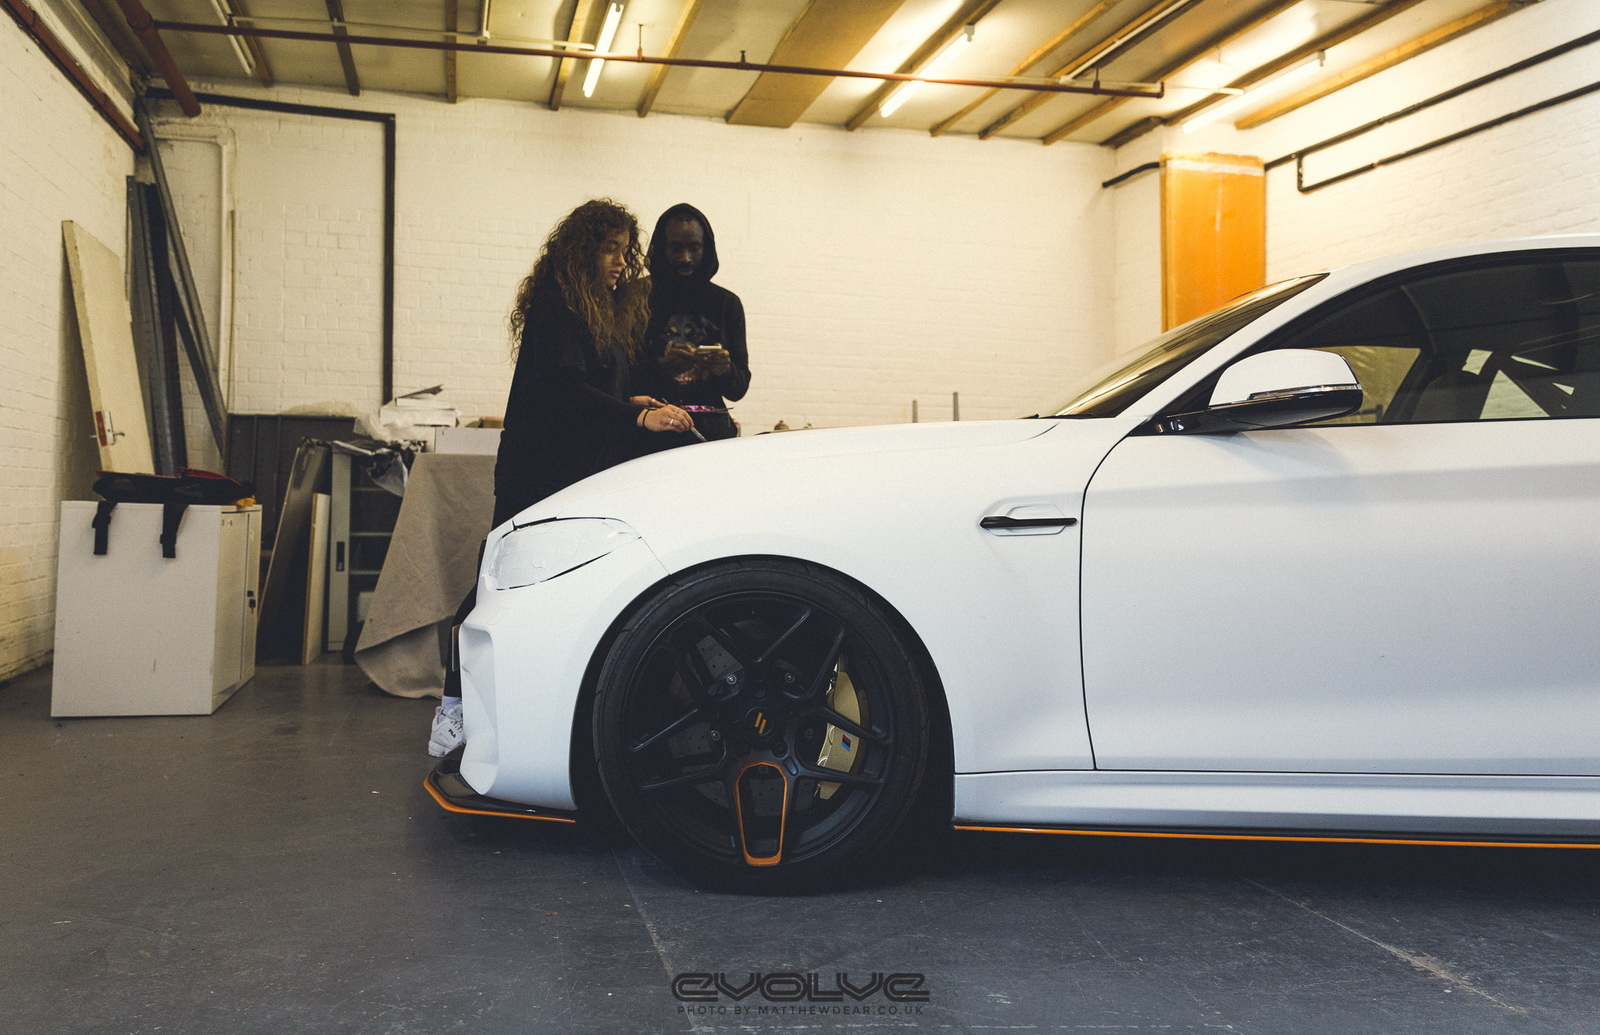 evolve-automotive-bmw-m2-gts-art-car-1